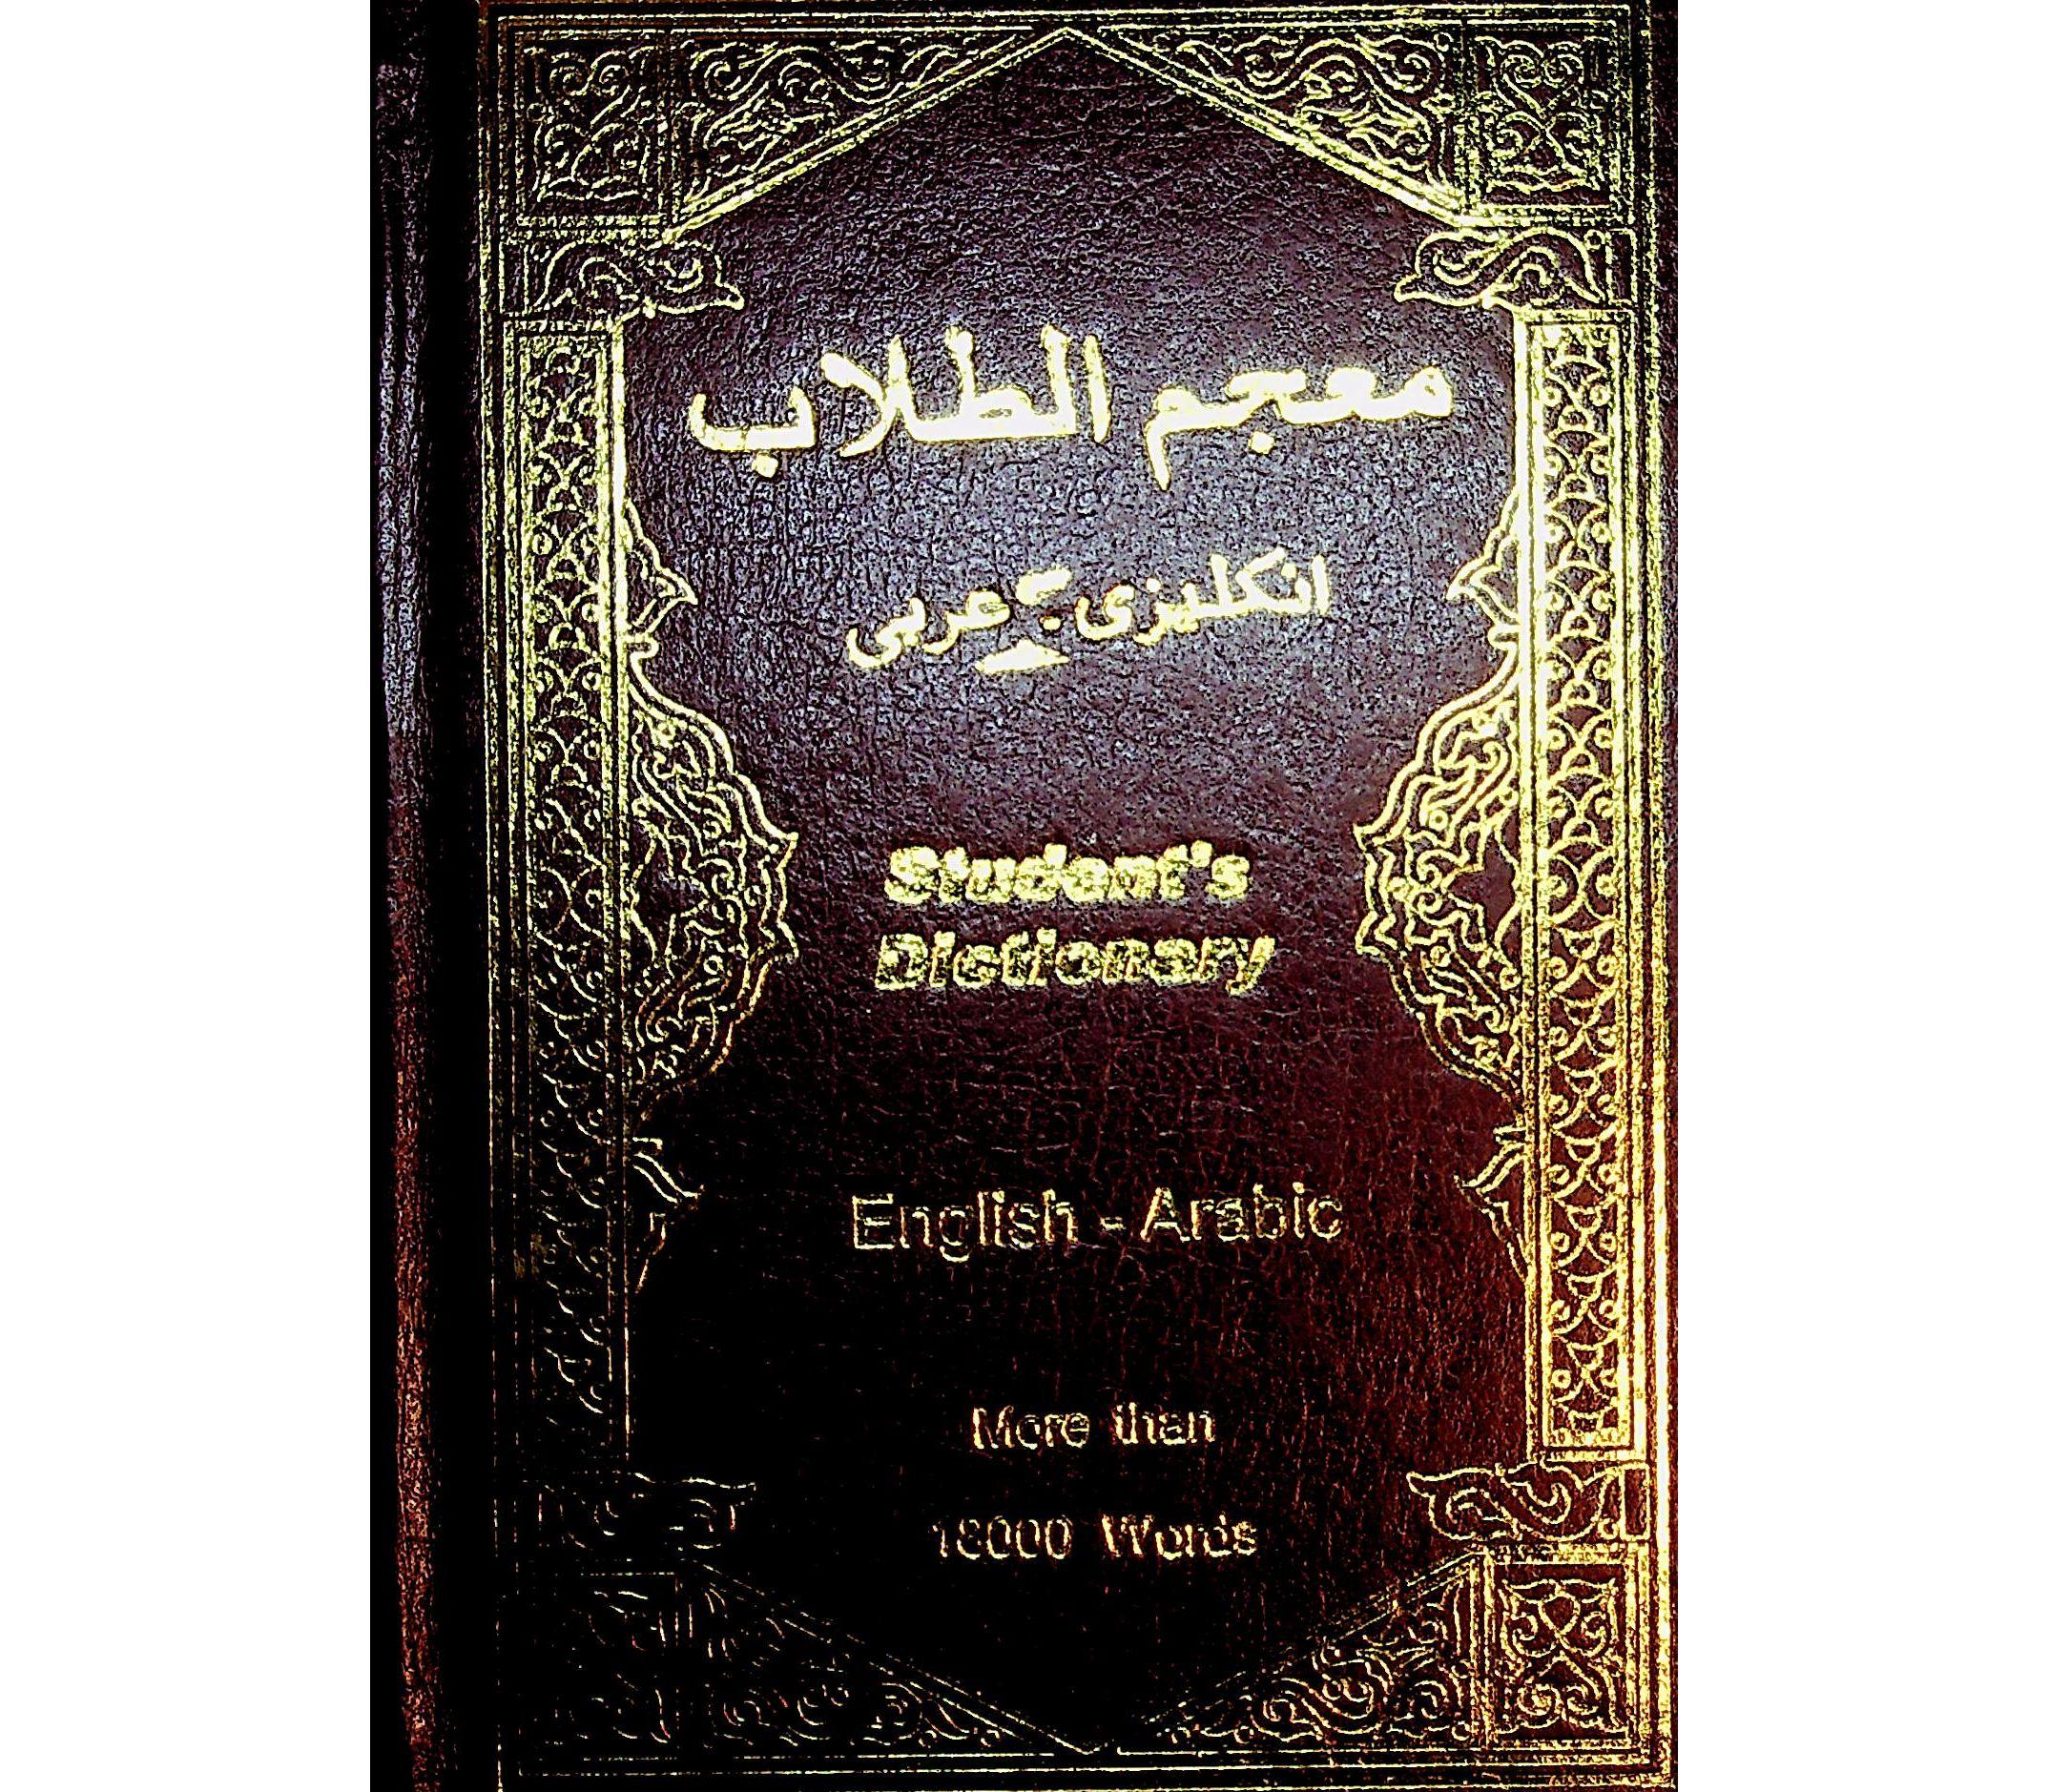 www dictionary english to arabic